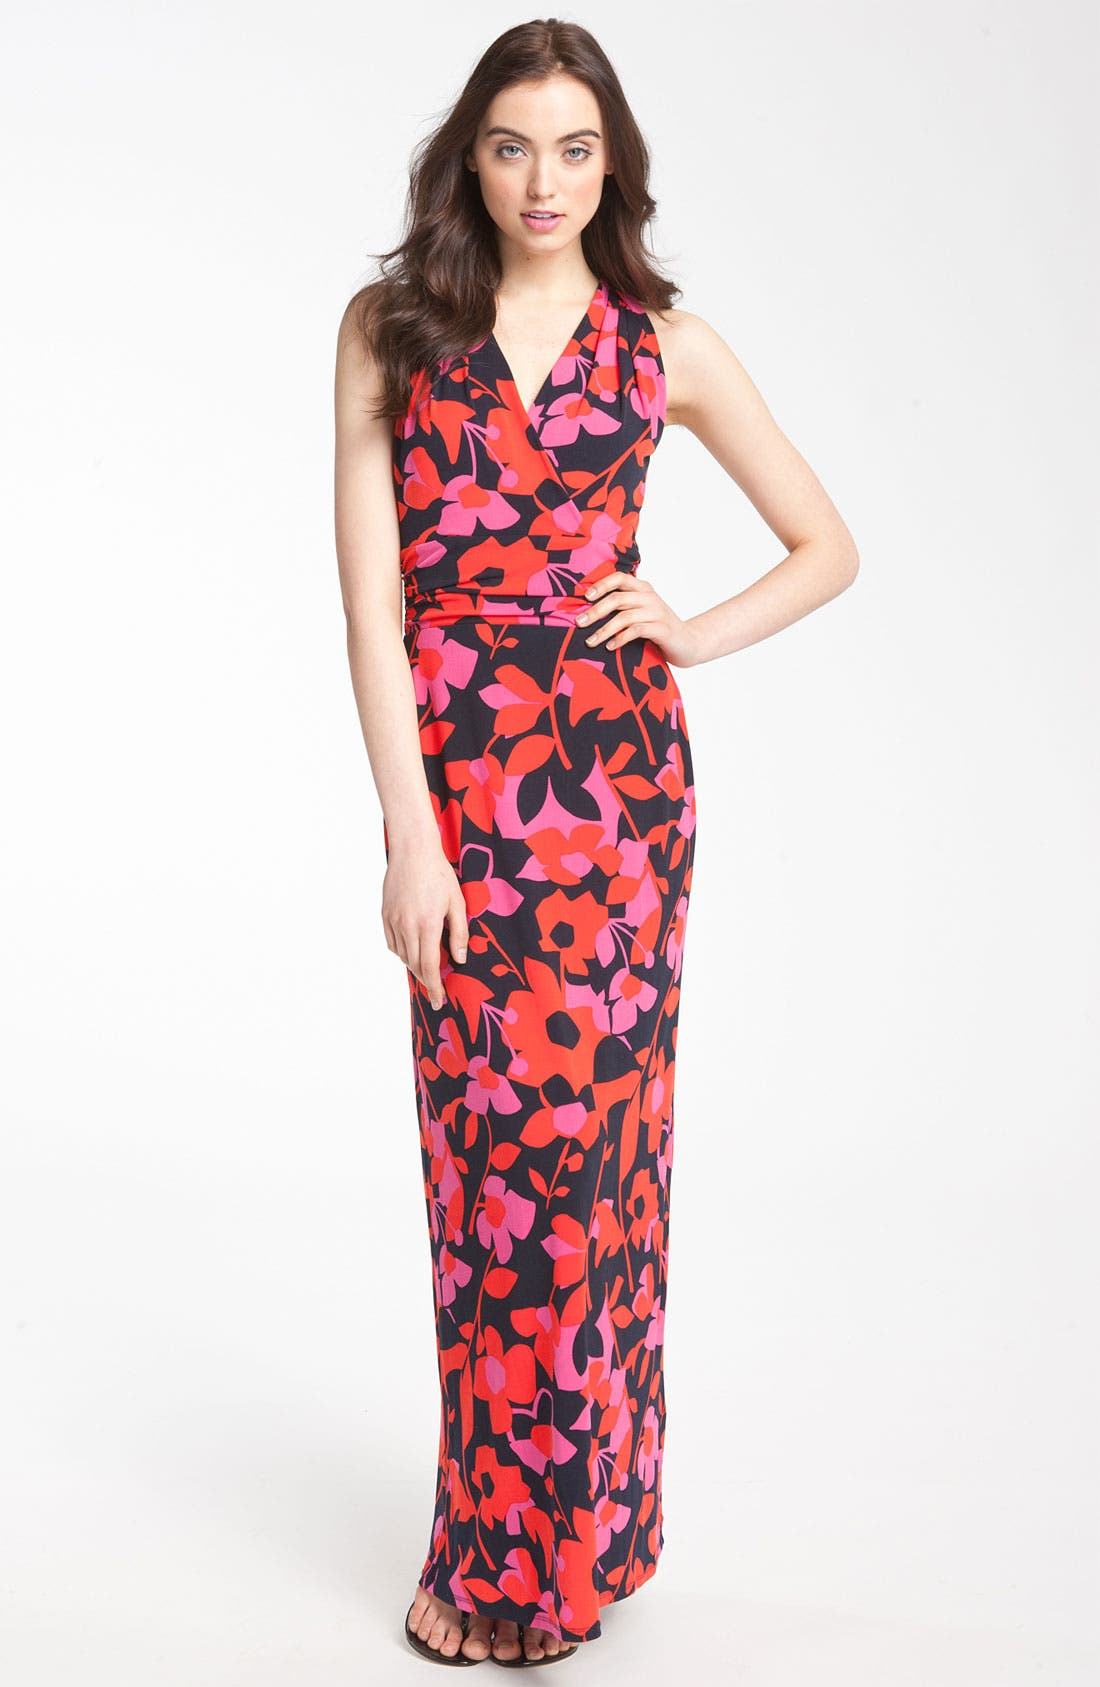 Alternate Image 1 Selected - Vince Camuto 'Island Cutout' Print Maxi Dress